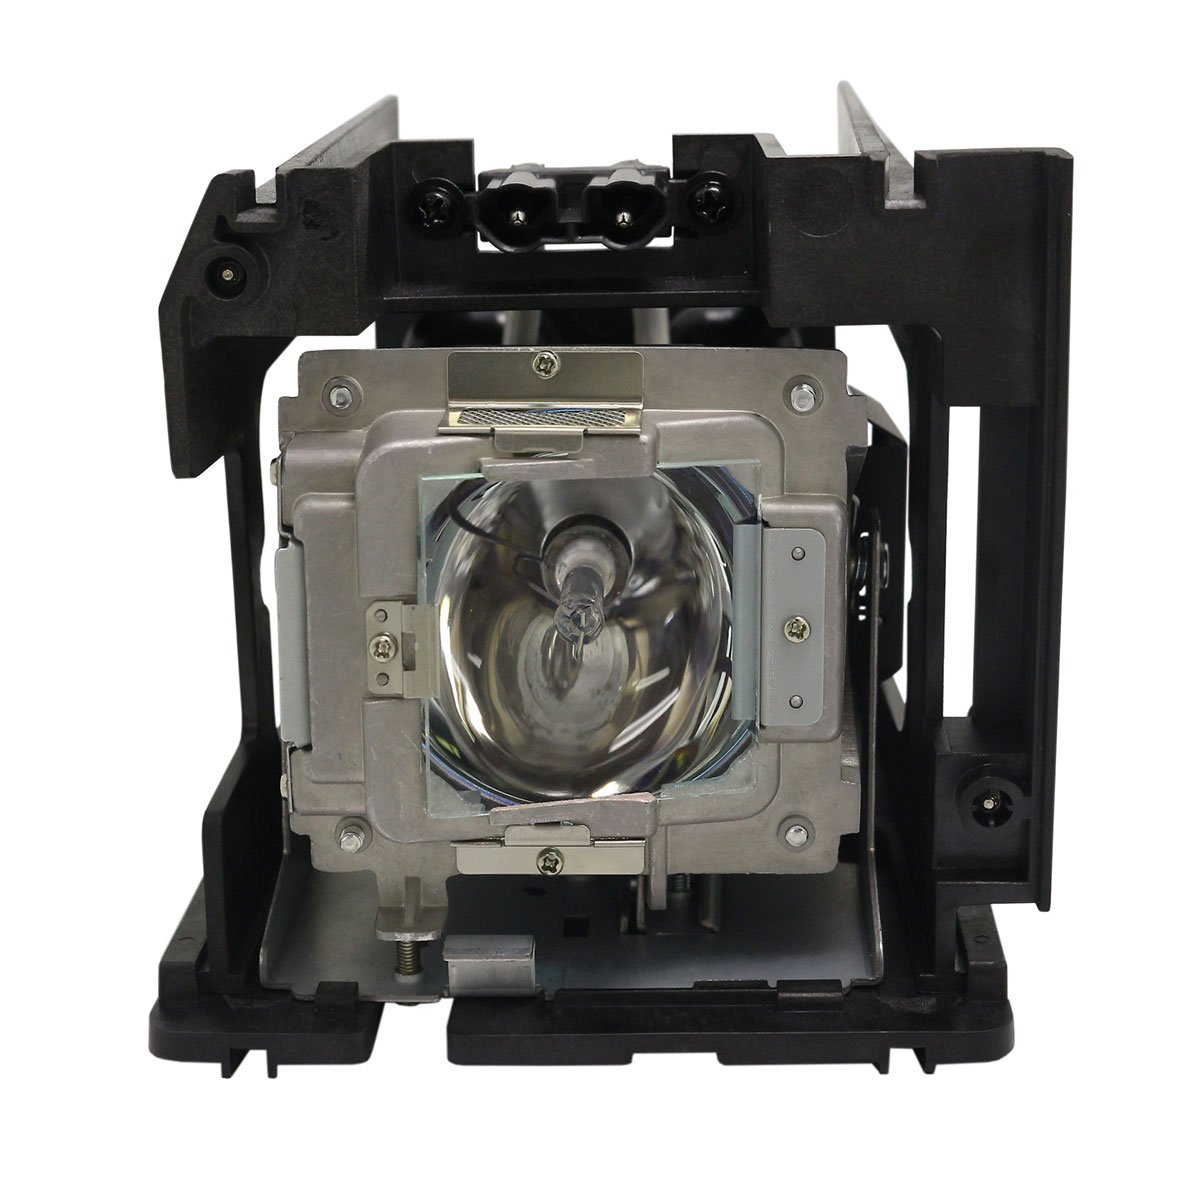 SpArc Platinum for Vivitek 5811118452-SVV Projector Lamp with Enclosure by Sparc Bulbs (Image #3)